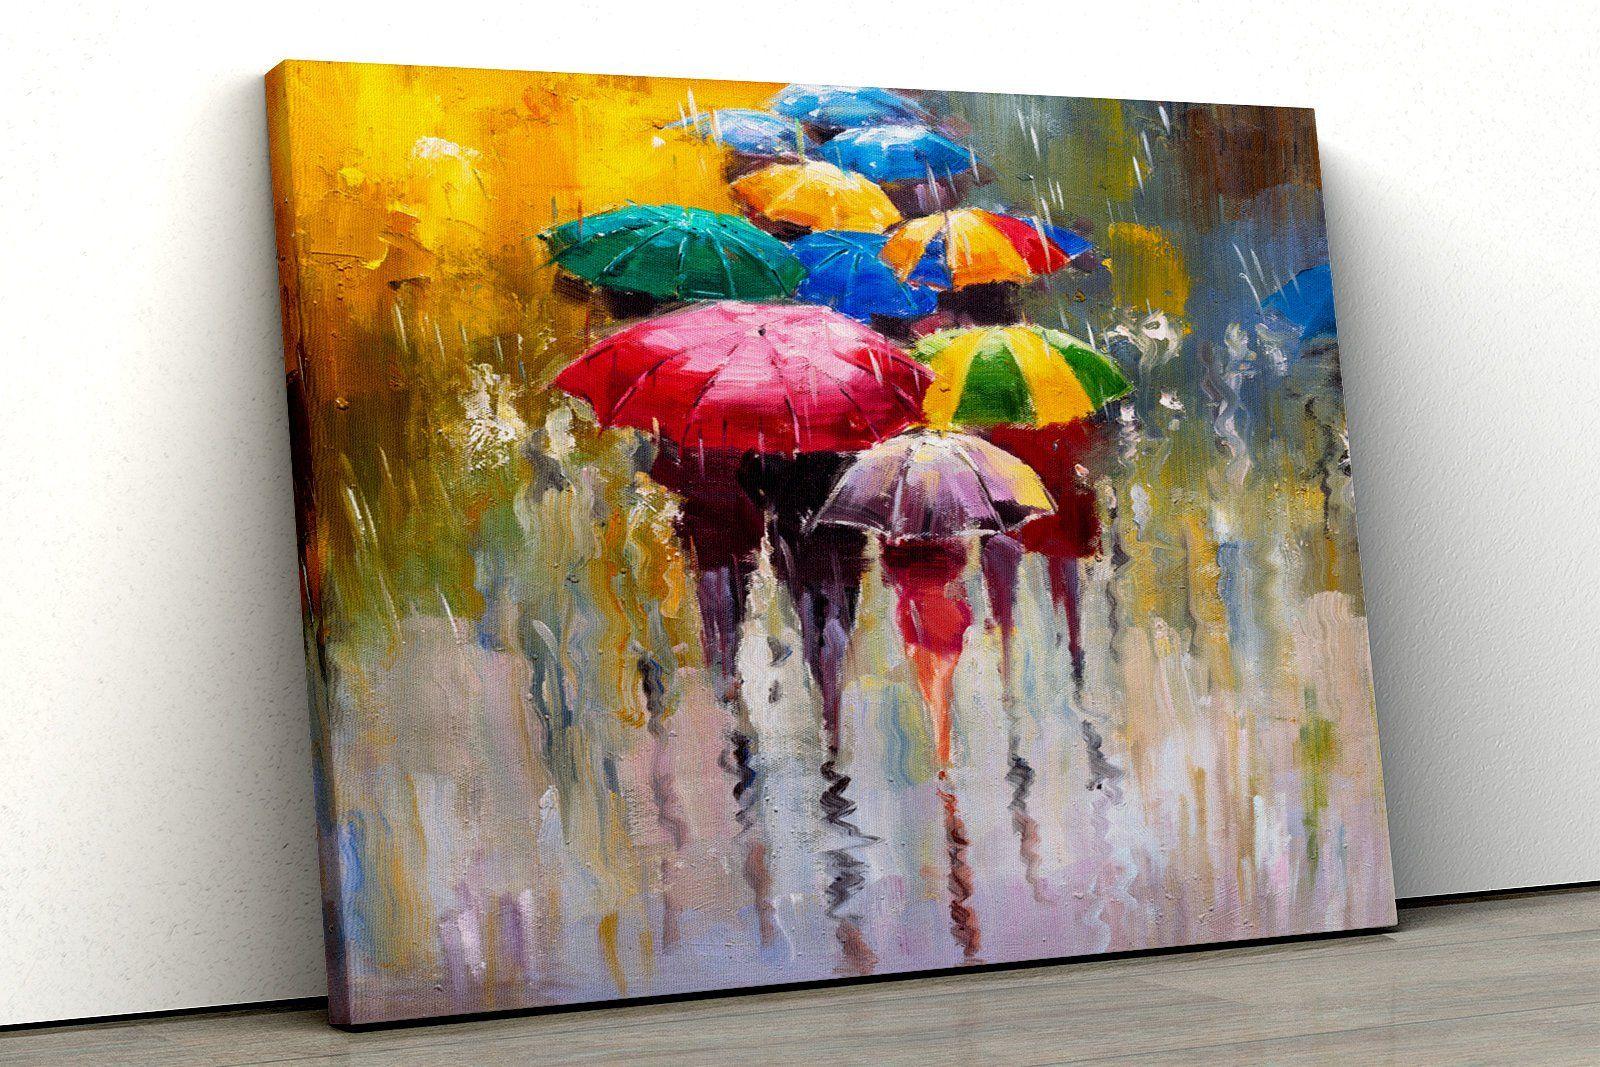 Multicoloured Umbrella Rain Yellow Red Framed Bedroom Bathroom Etsy Abstract Canvas Art Abstract Canvas Framed Canvas Prints